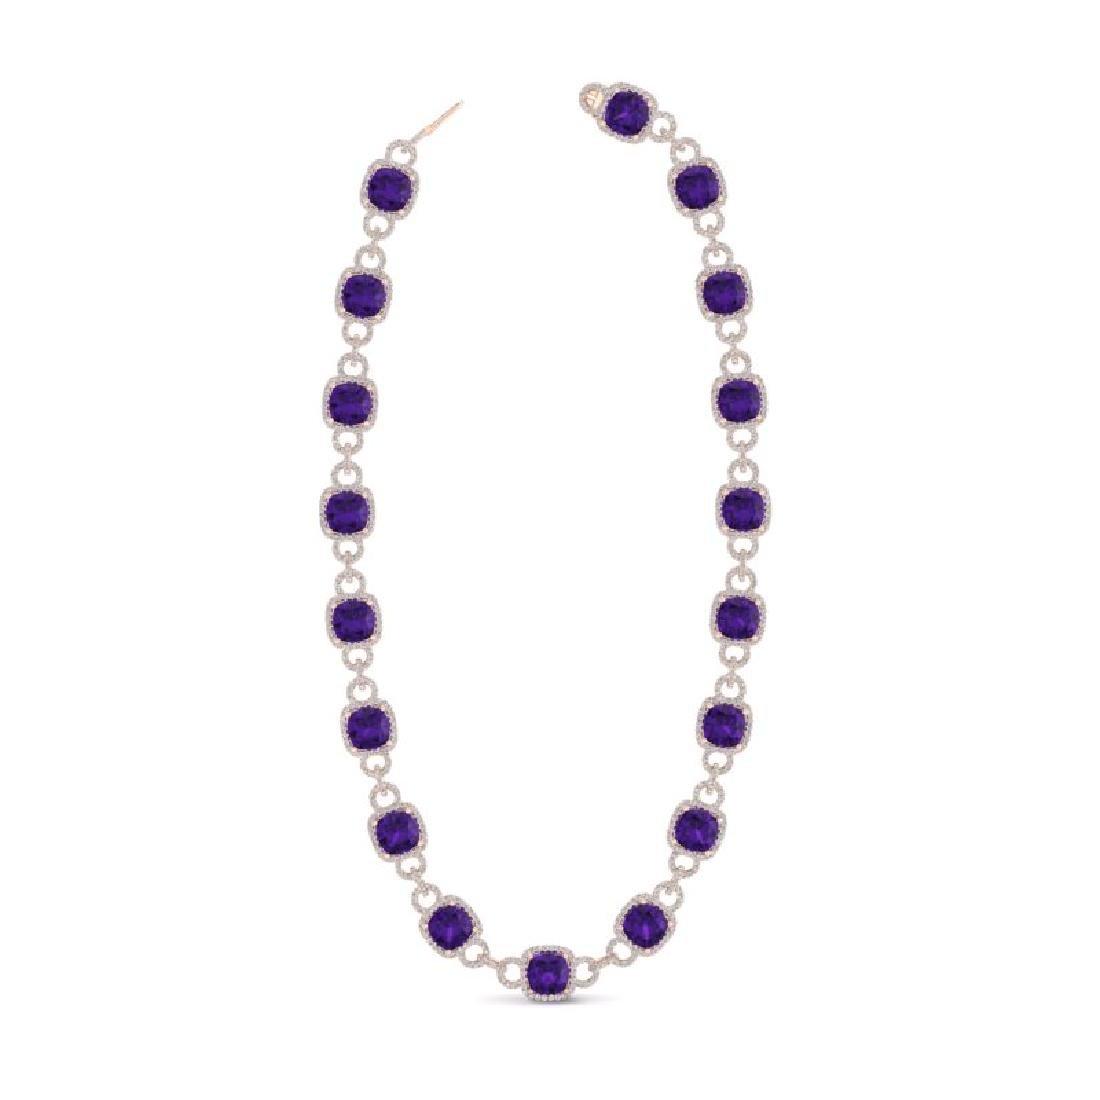 66 CTW Amethyst & VS/SI Diamond Necklace 14K Rose Gold - 2